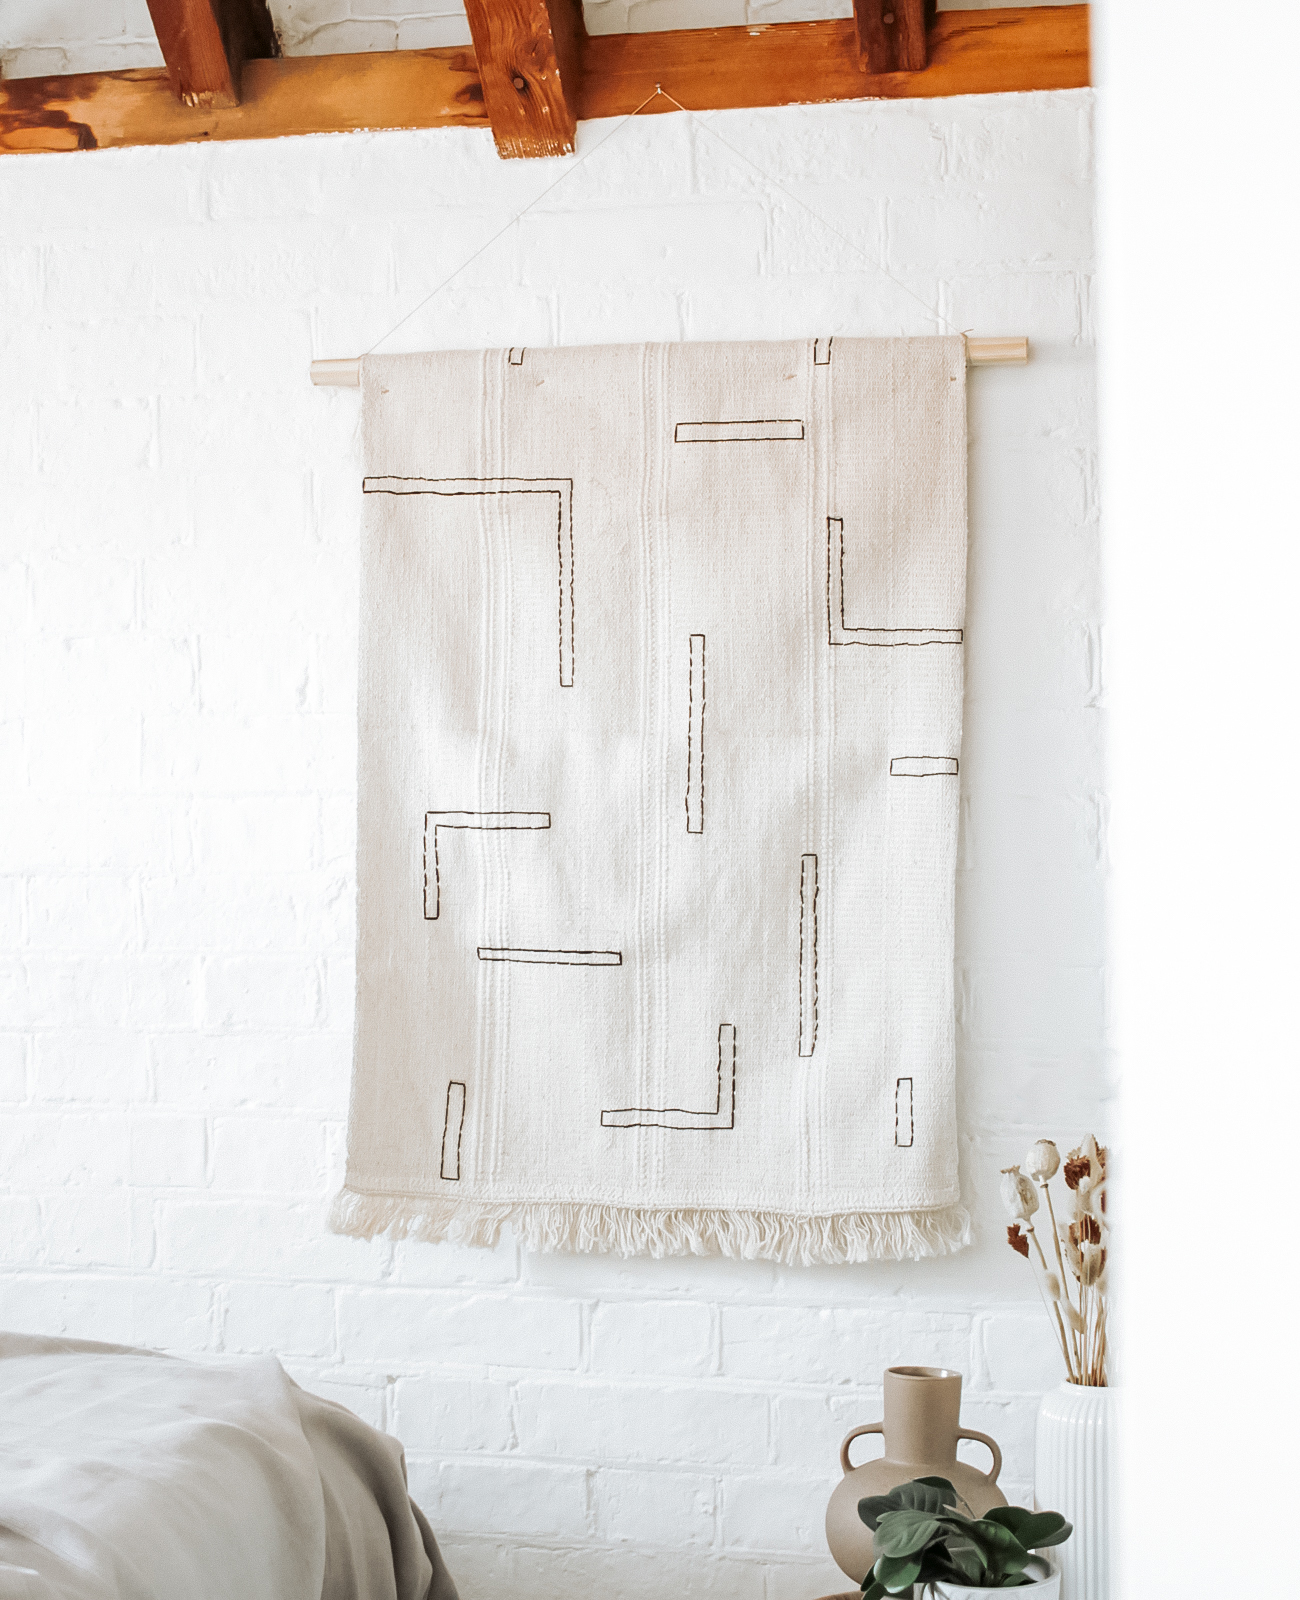 tapis deco murale broderie Ikea Hack tuto diy